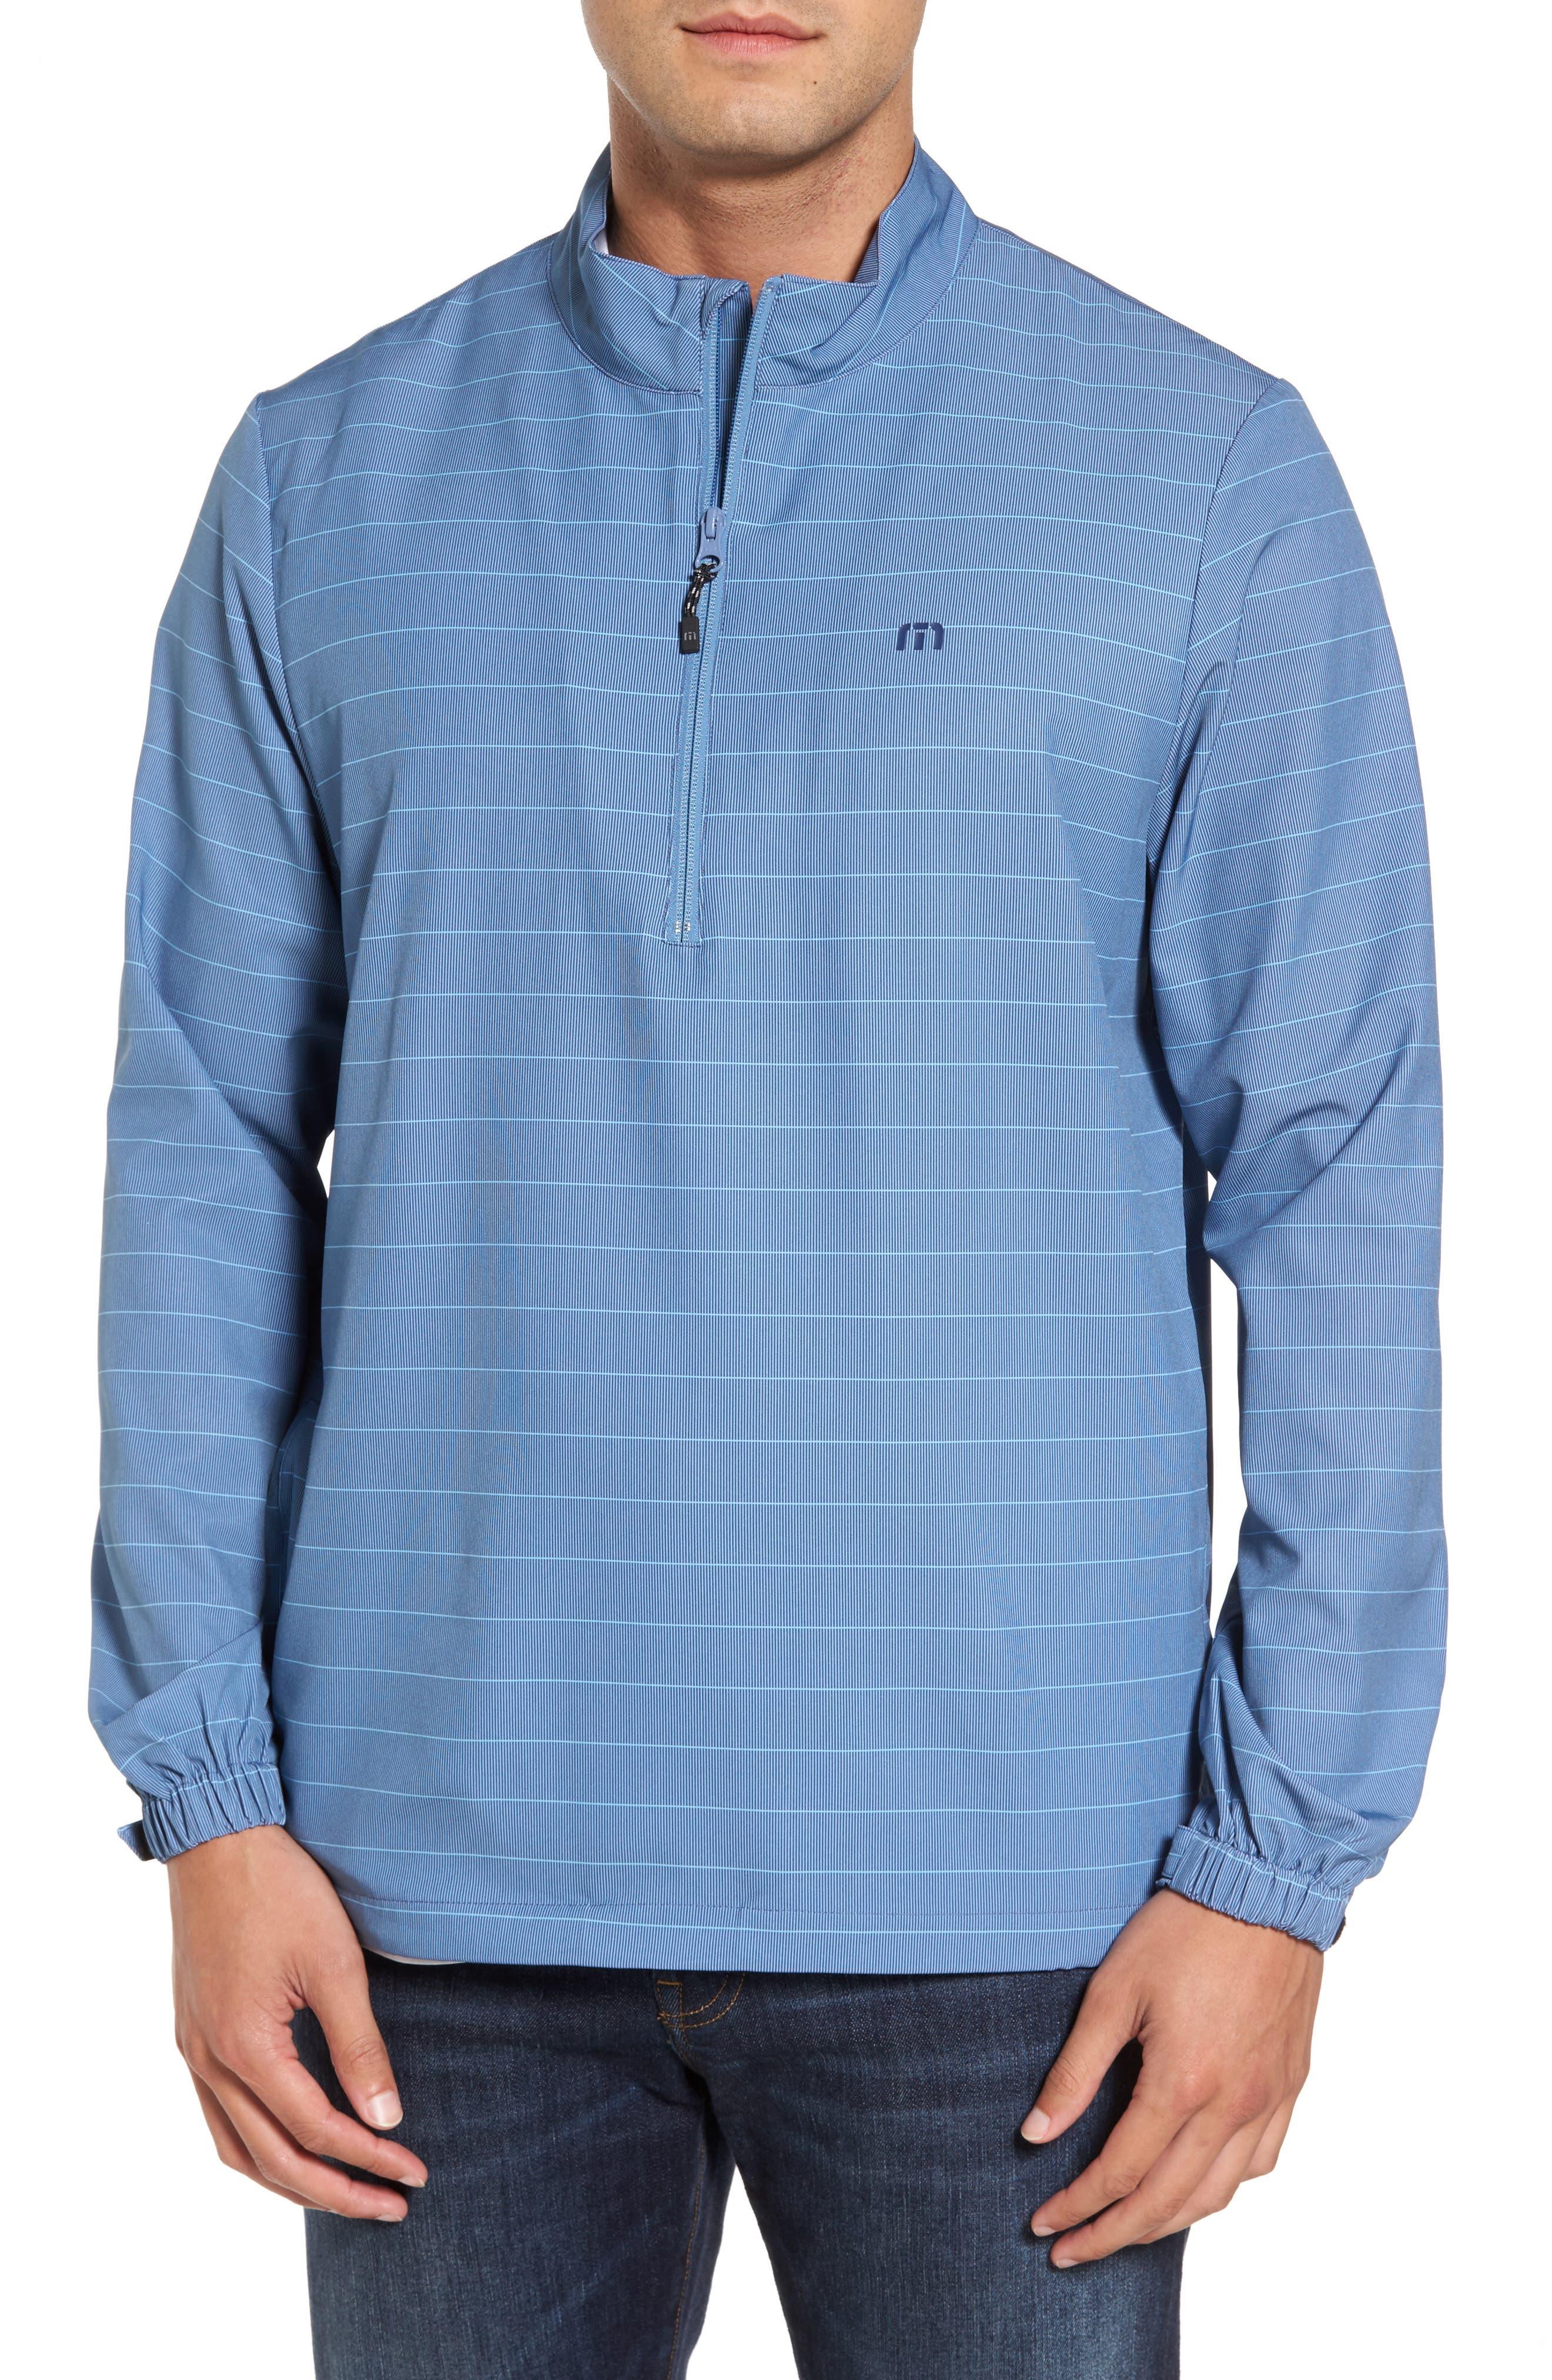 Dubes Quarter Zip Pullover Jacket,                         Main,                         color, Blue Indigo